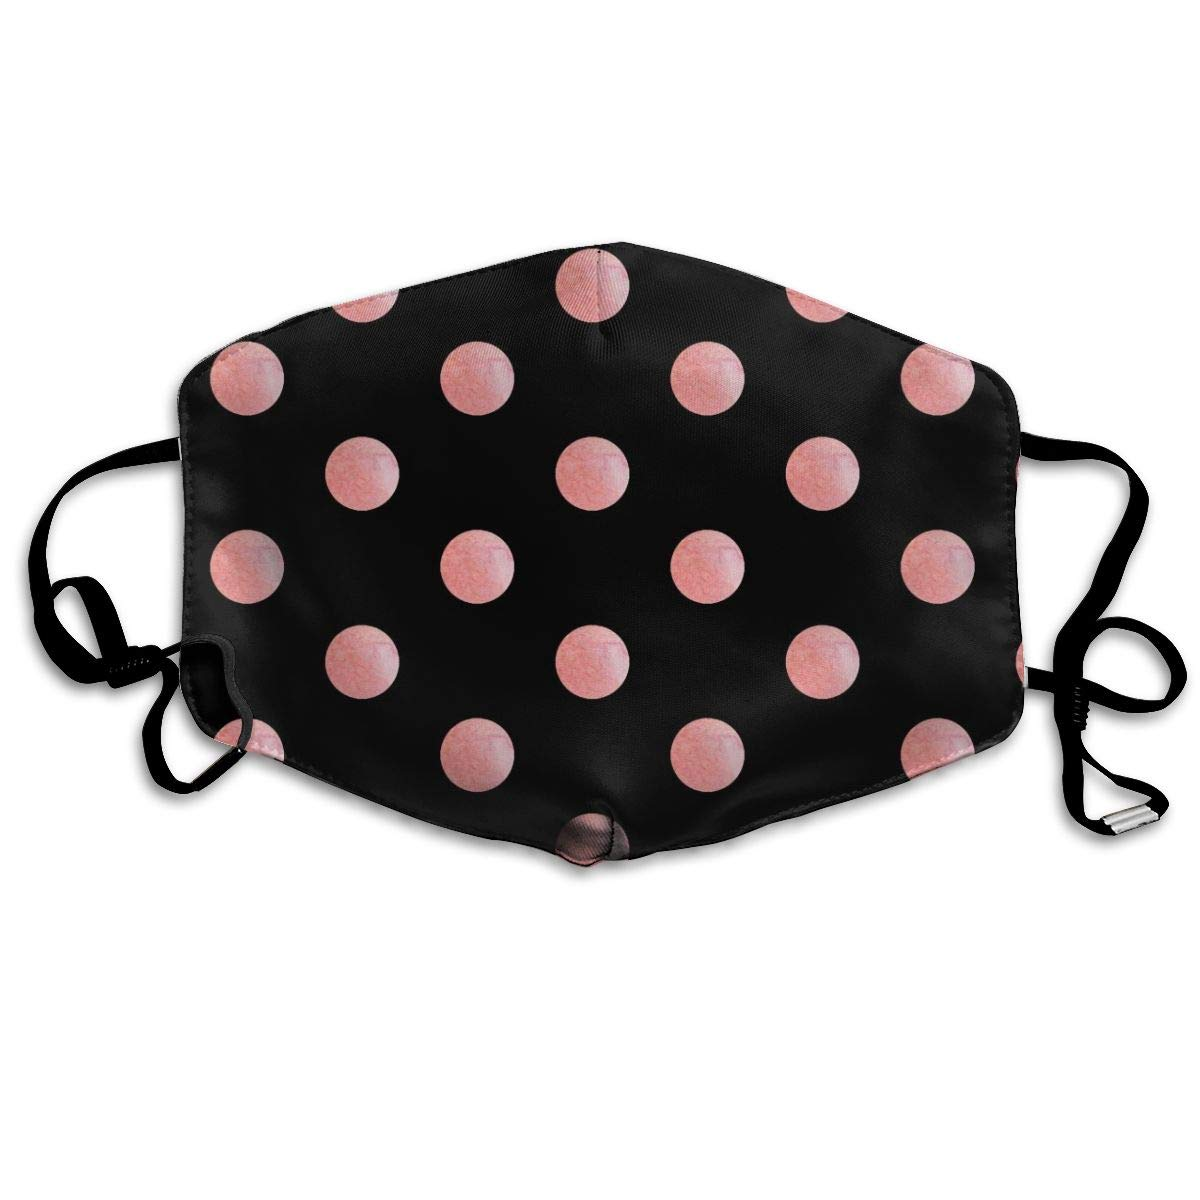 Unisex Anti-dust Face Mask Pink Black Polka Dot Mouth Mask Reusable